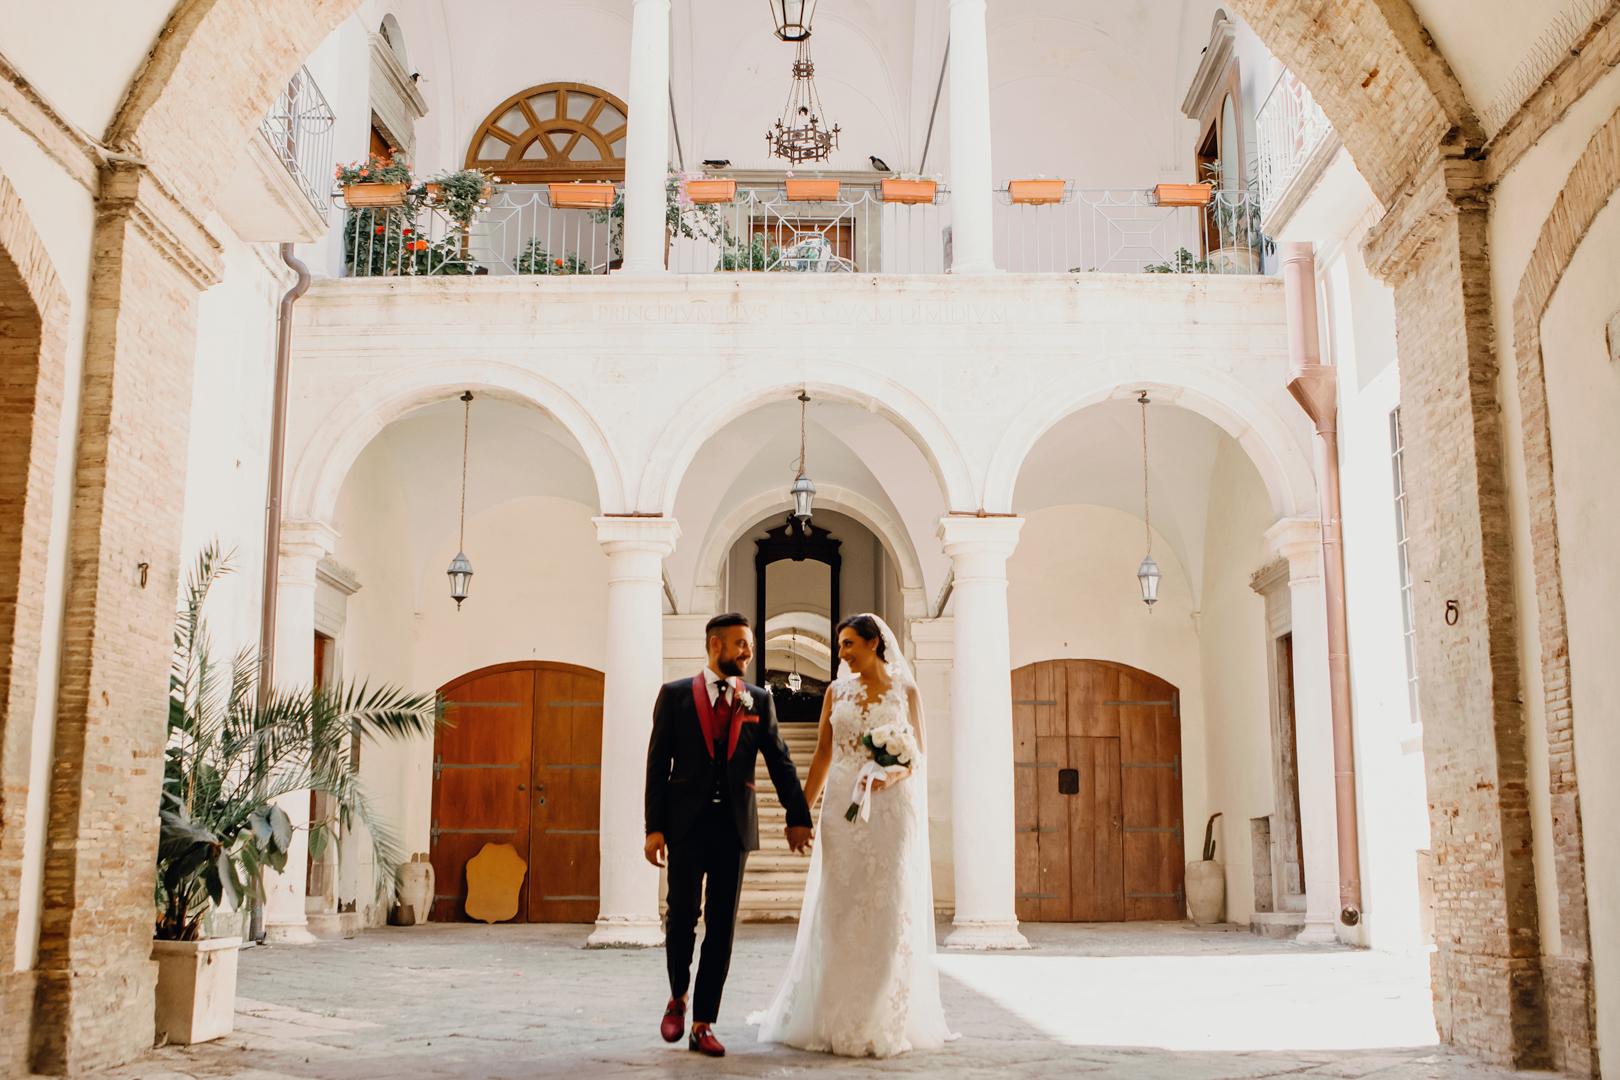 45 gianni-lepore-lucera-wedding-sposi-palazzo-vescoile-piazza-duomo